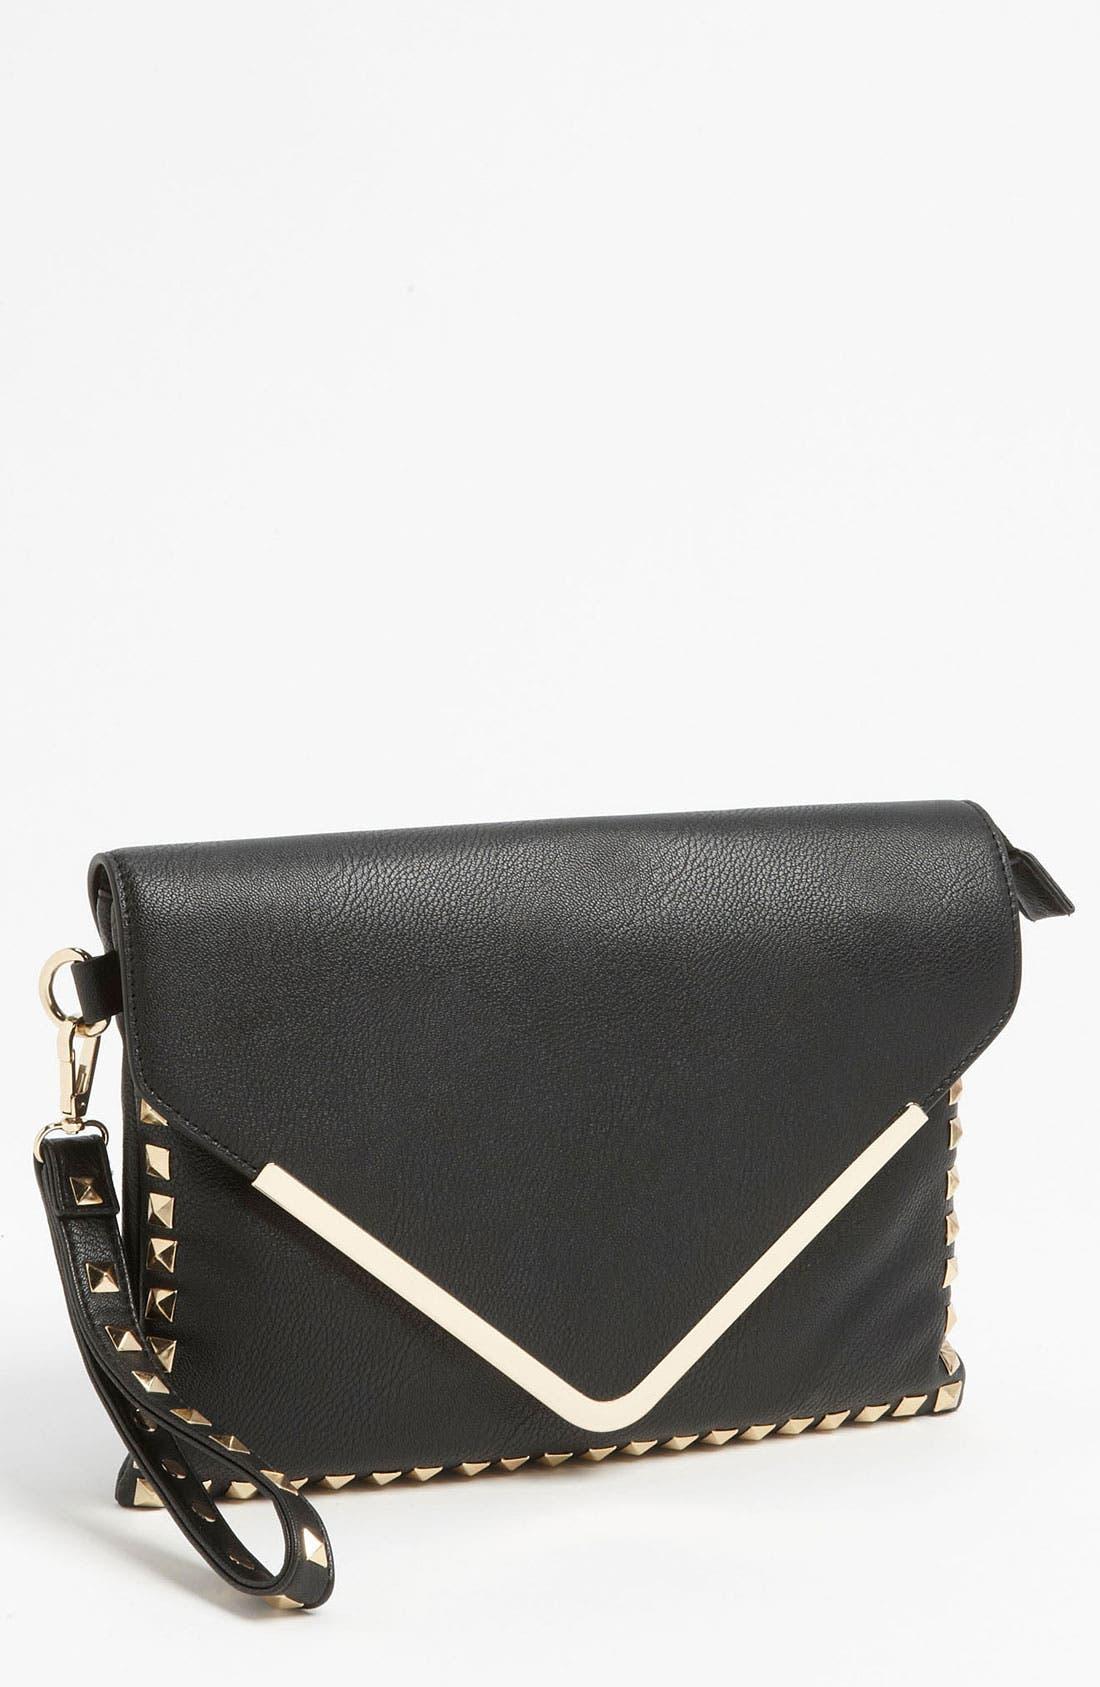 Main Image - High Fashion Handbags Studded Envelope Clutch